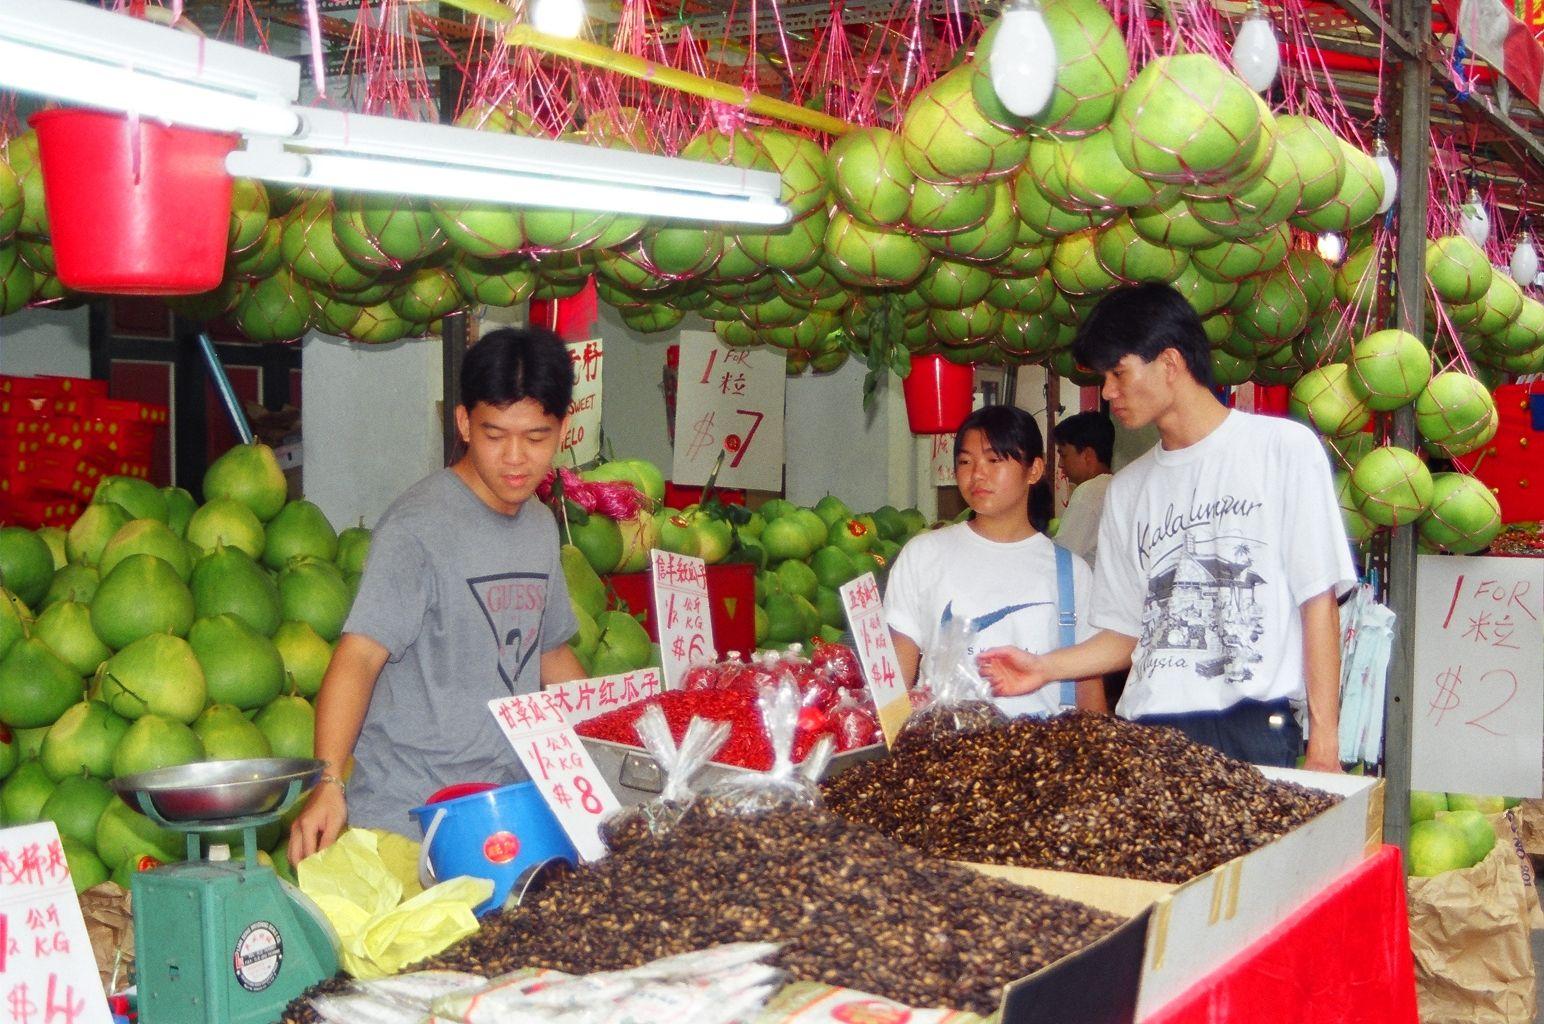 Markt, Malaysia